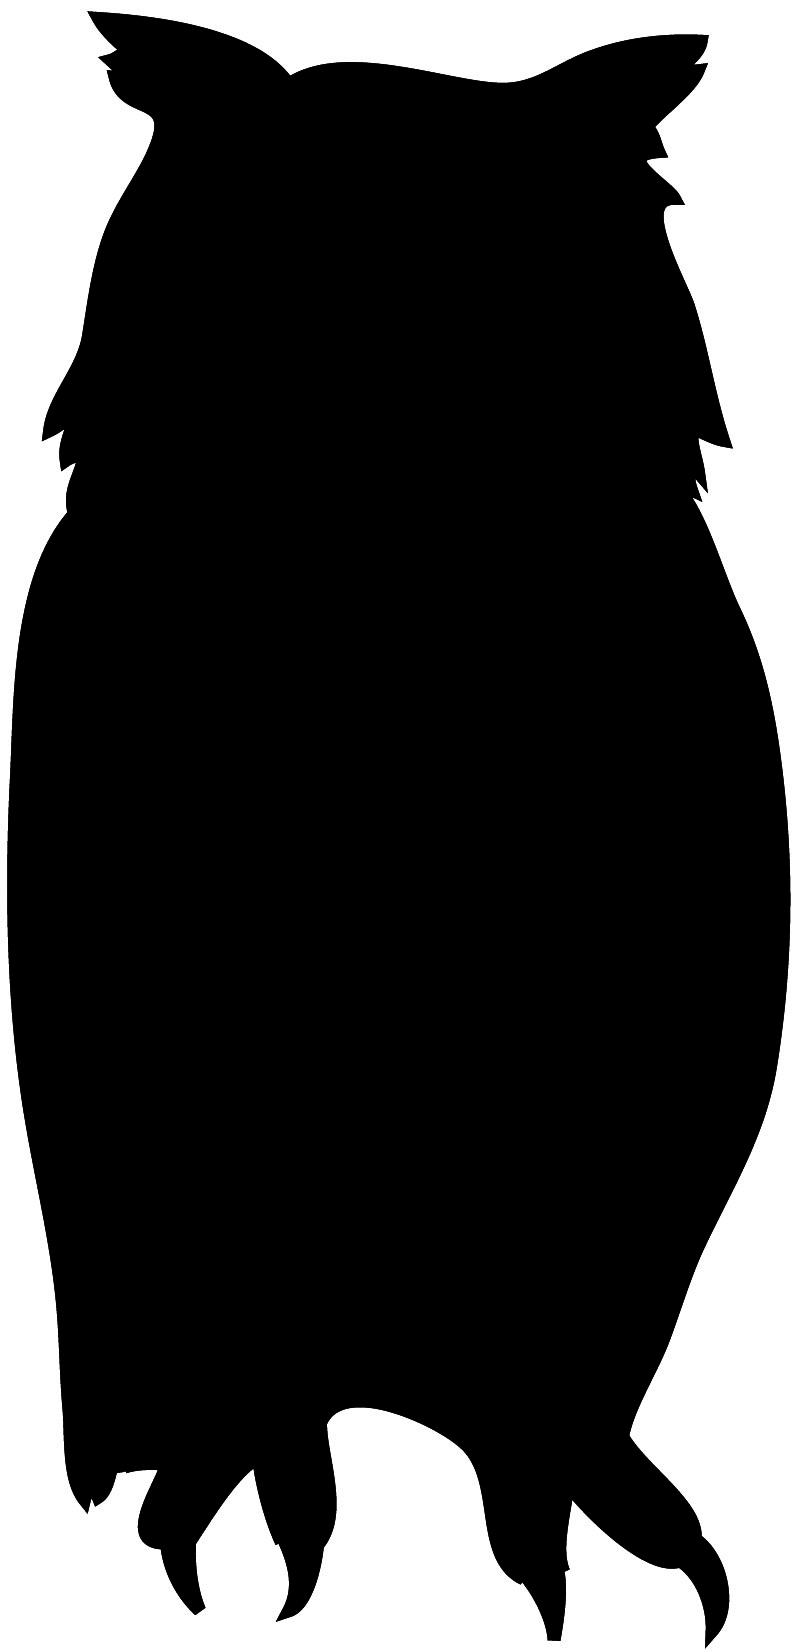 Toucan Silhouette